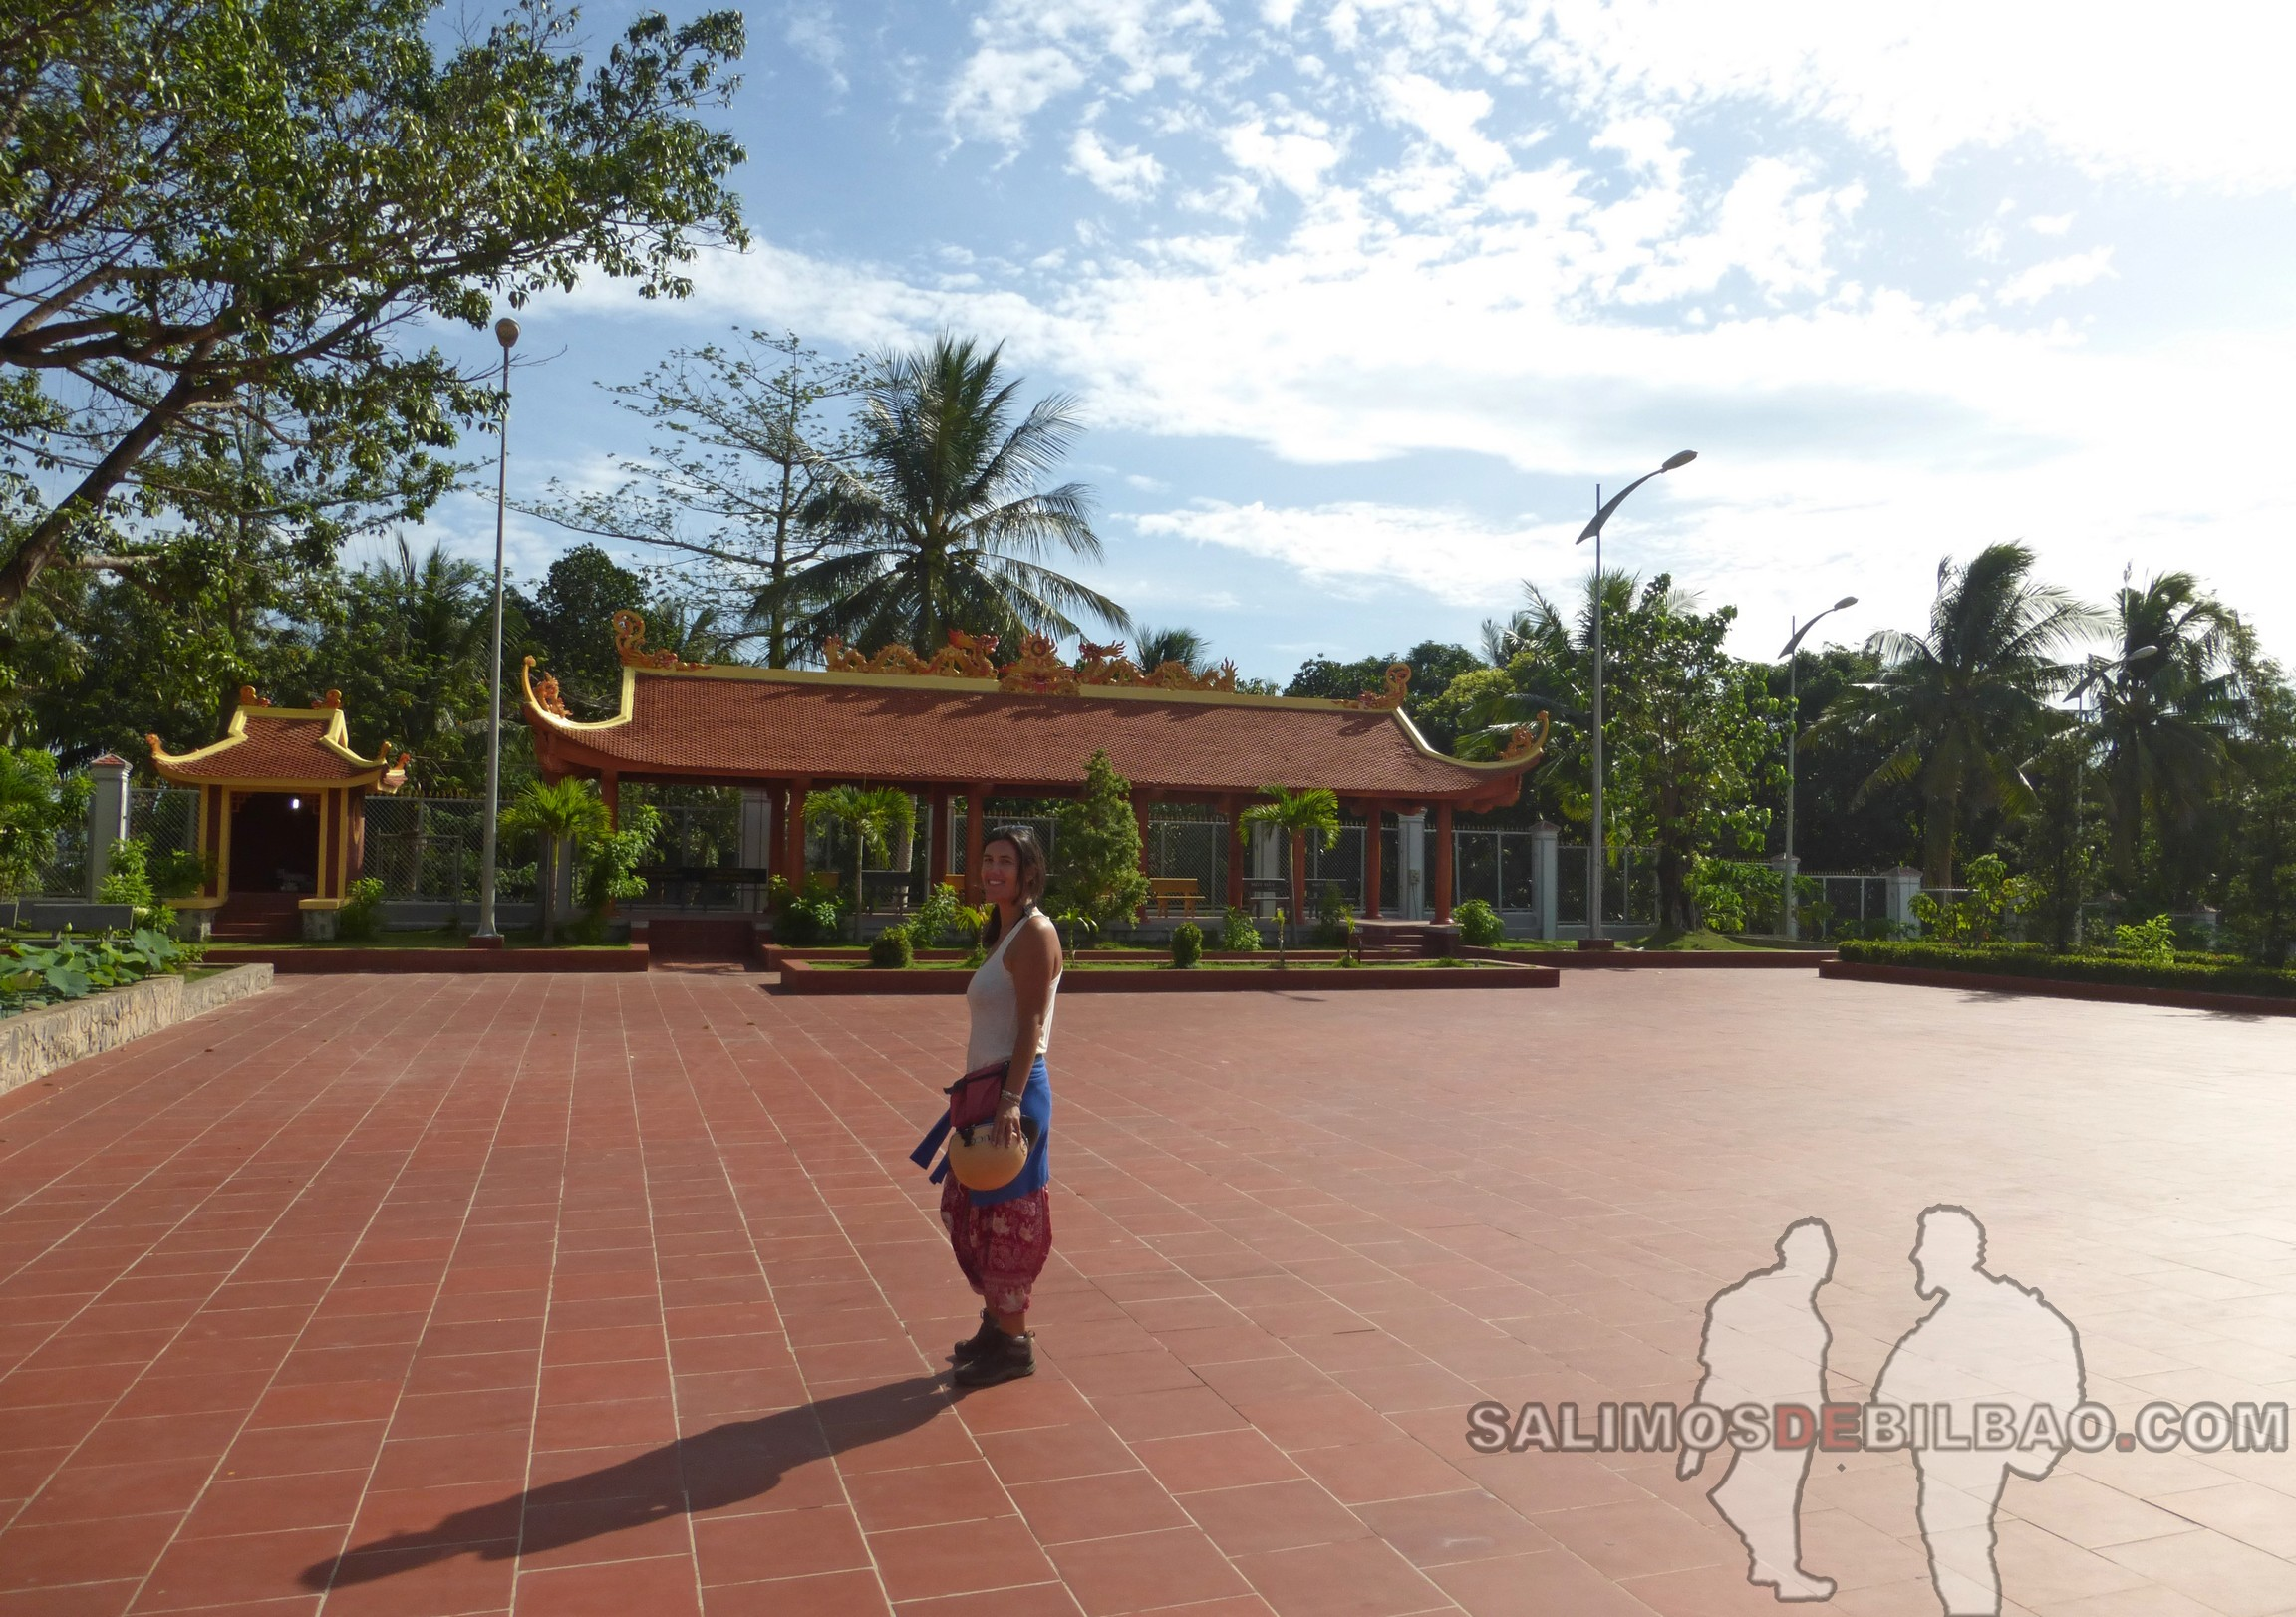 0133. Saioa, Pagoda Dinh Nguyen Trung Truc, Noreste de Phu Quoc